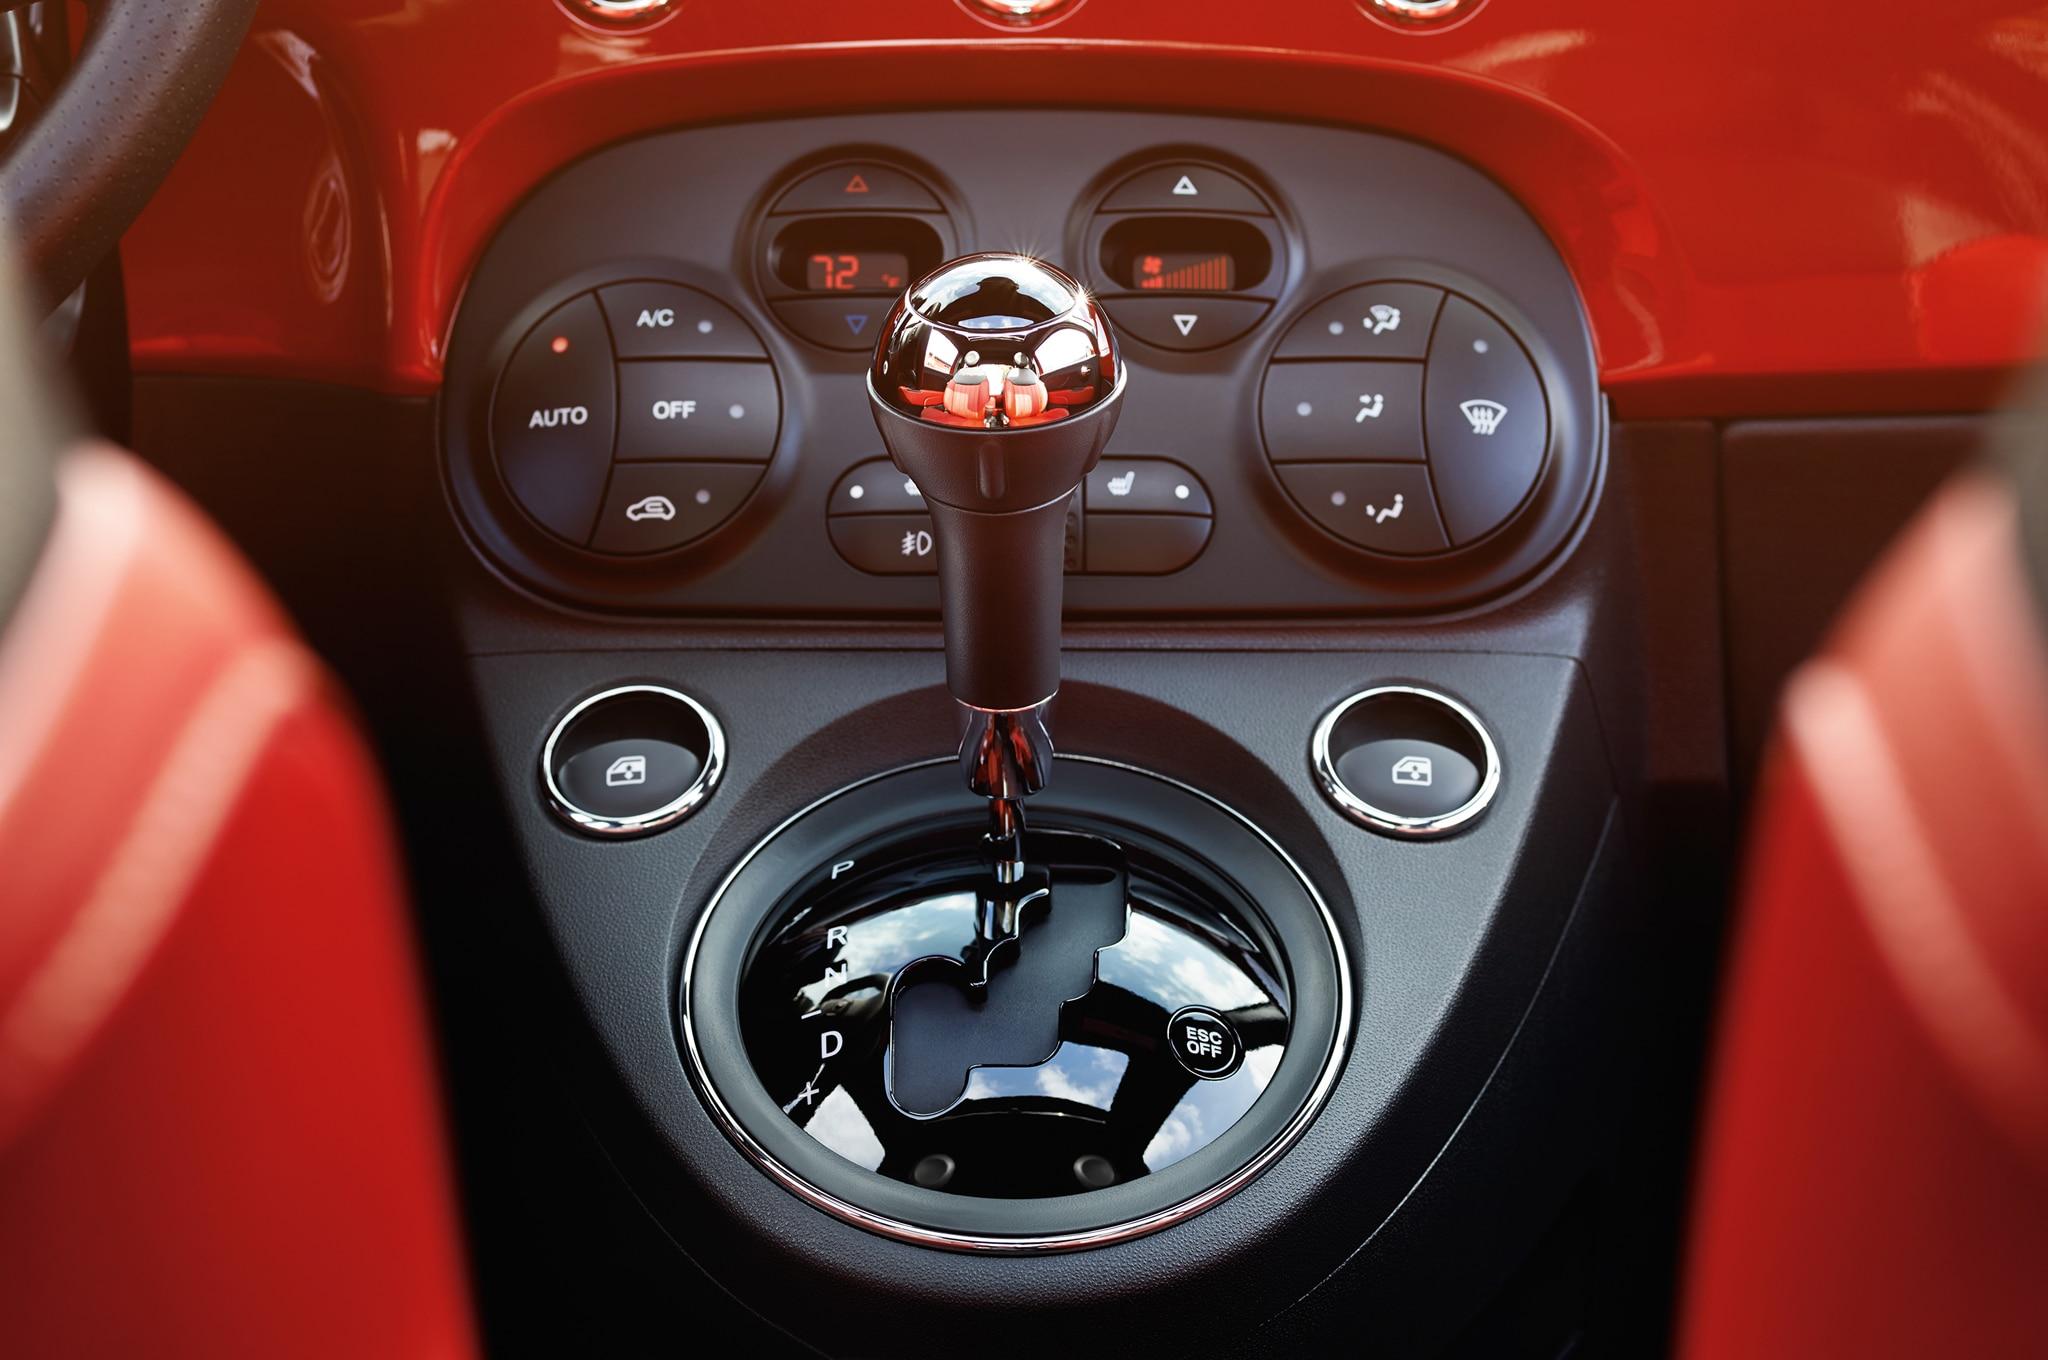 2016 fiat 500x interior. 2015 fiat 500 shifter 2016 500x interior